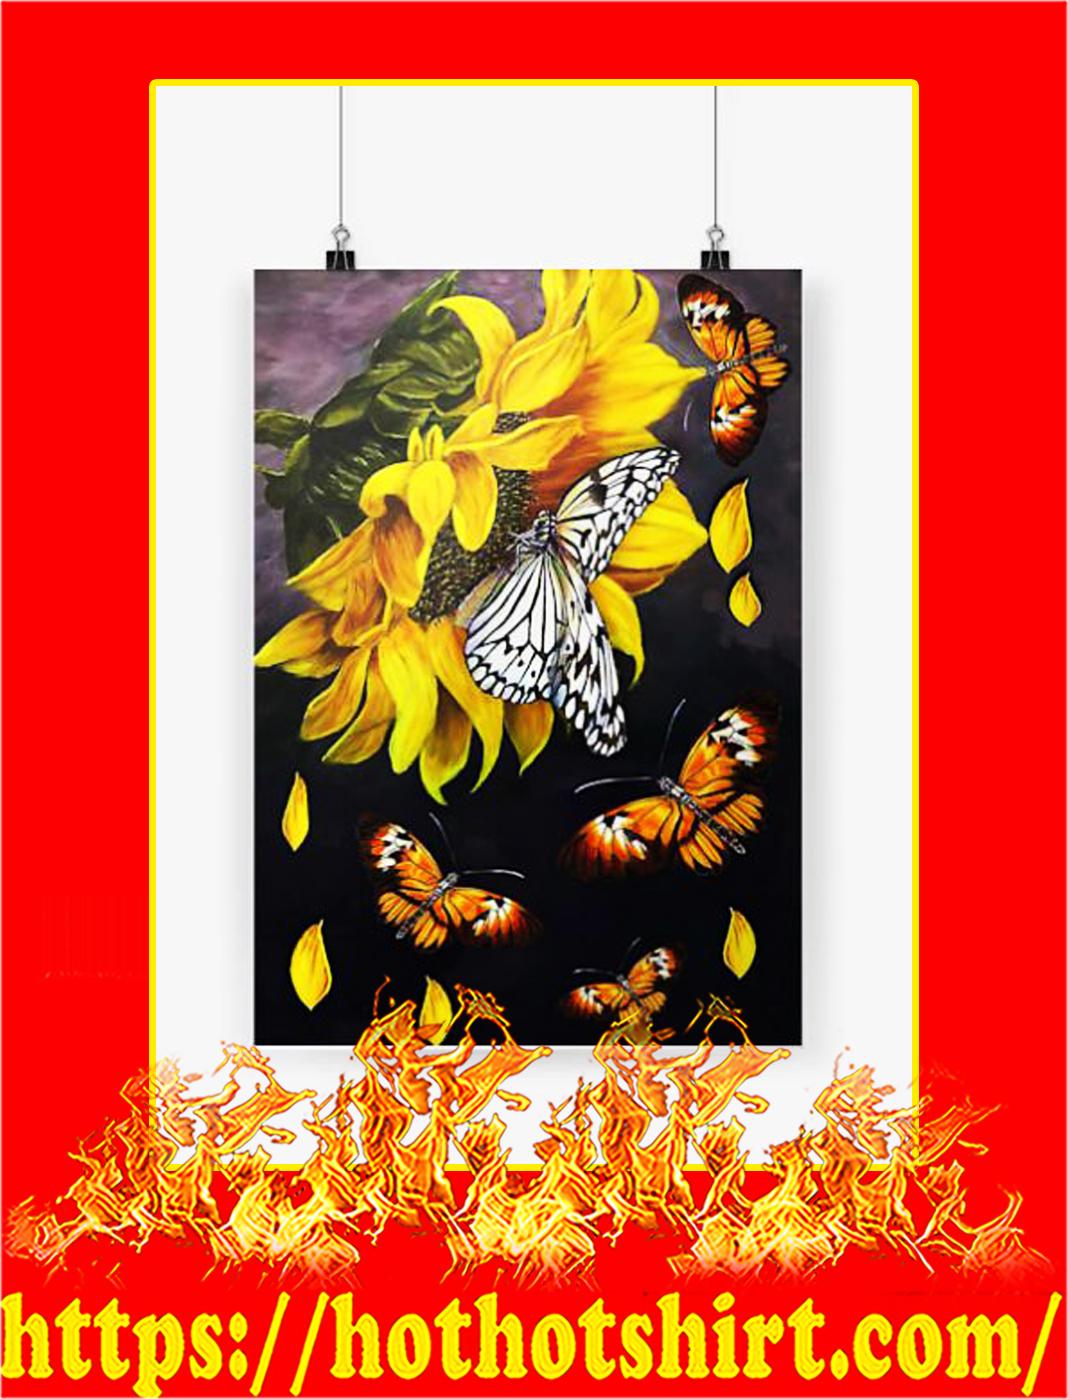 Butterfly sunflower poster - A2